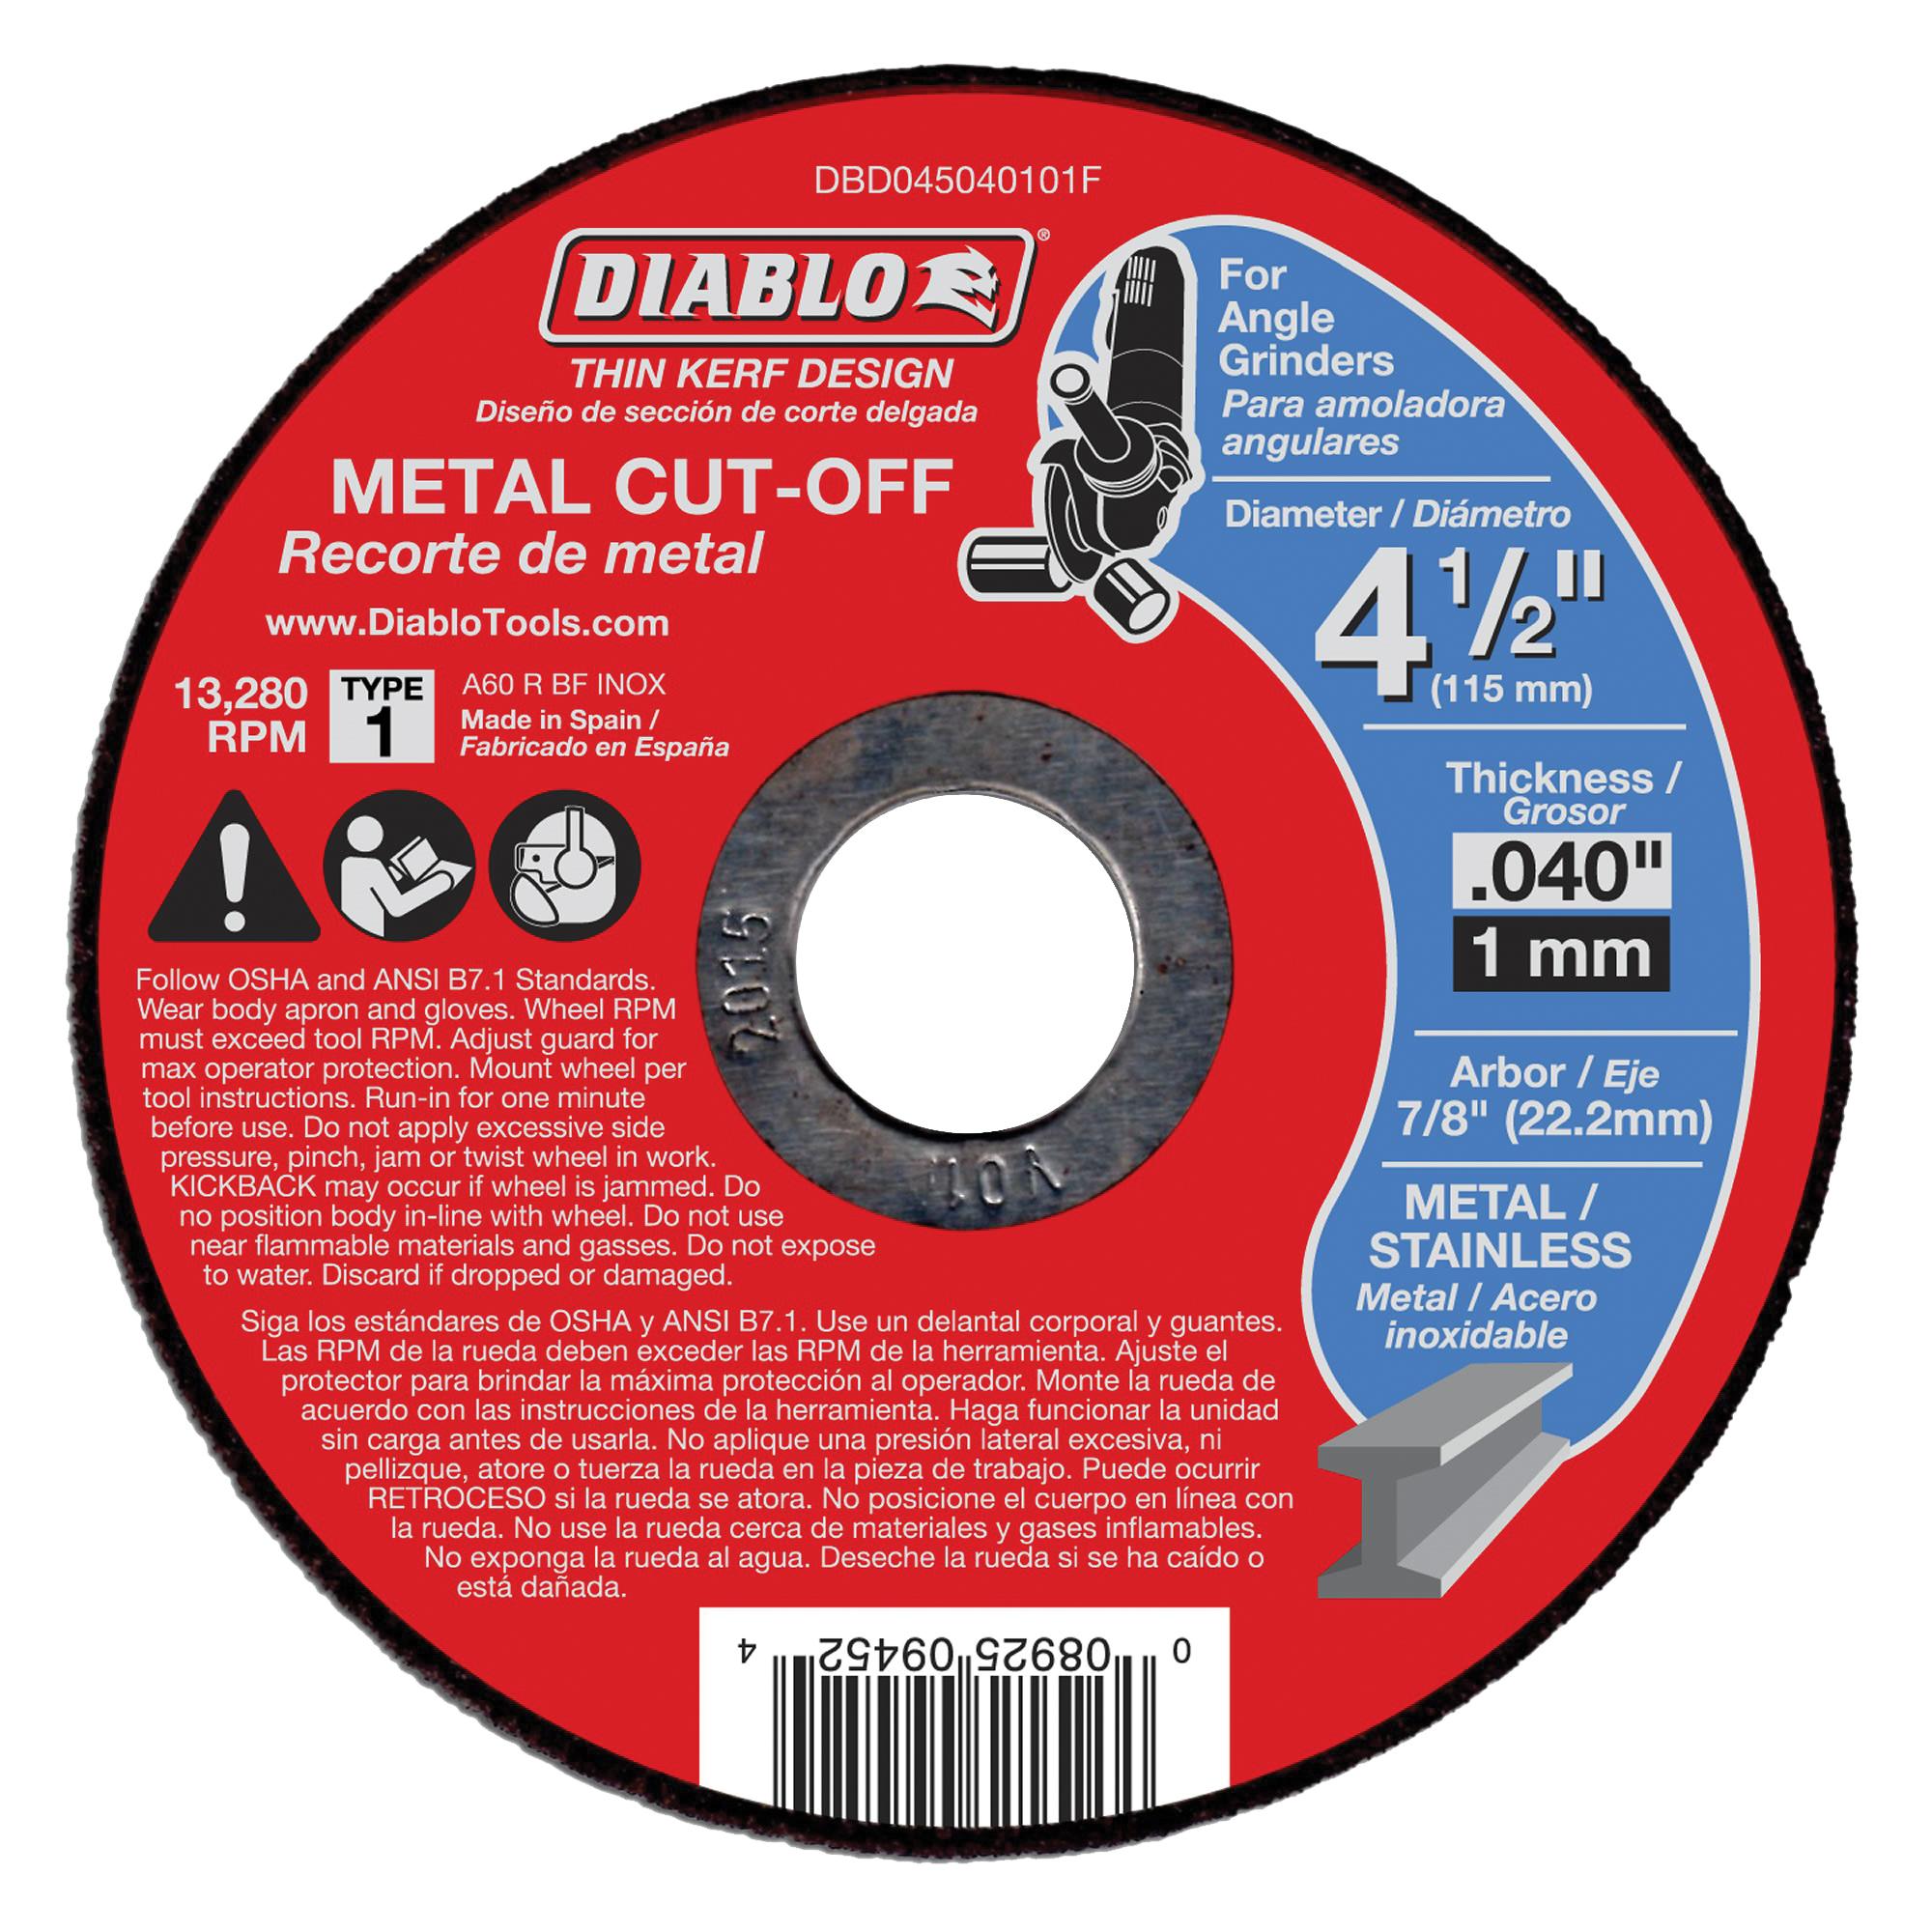 Picture of Diablo DBD045040101F Cut-Off Wheel, 4-1/2 in Dia, 0.04 in Thick, 7/8 in Arbor, Aluminum Oxide Abrasive